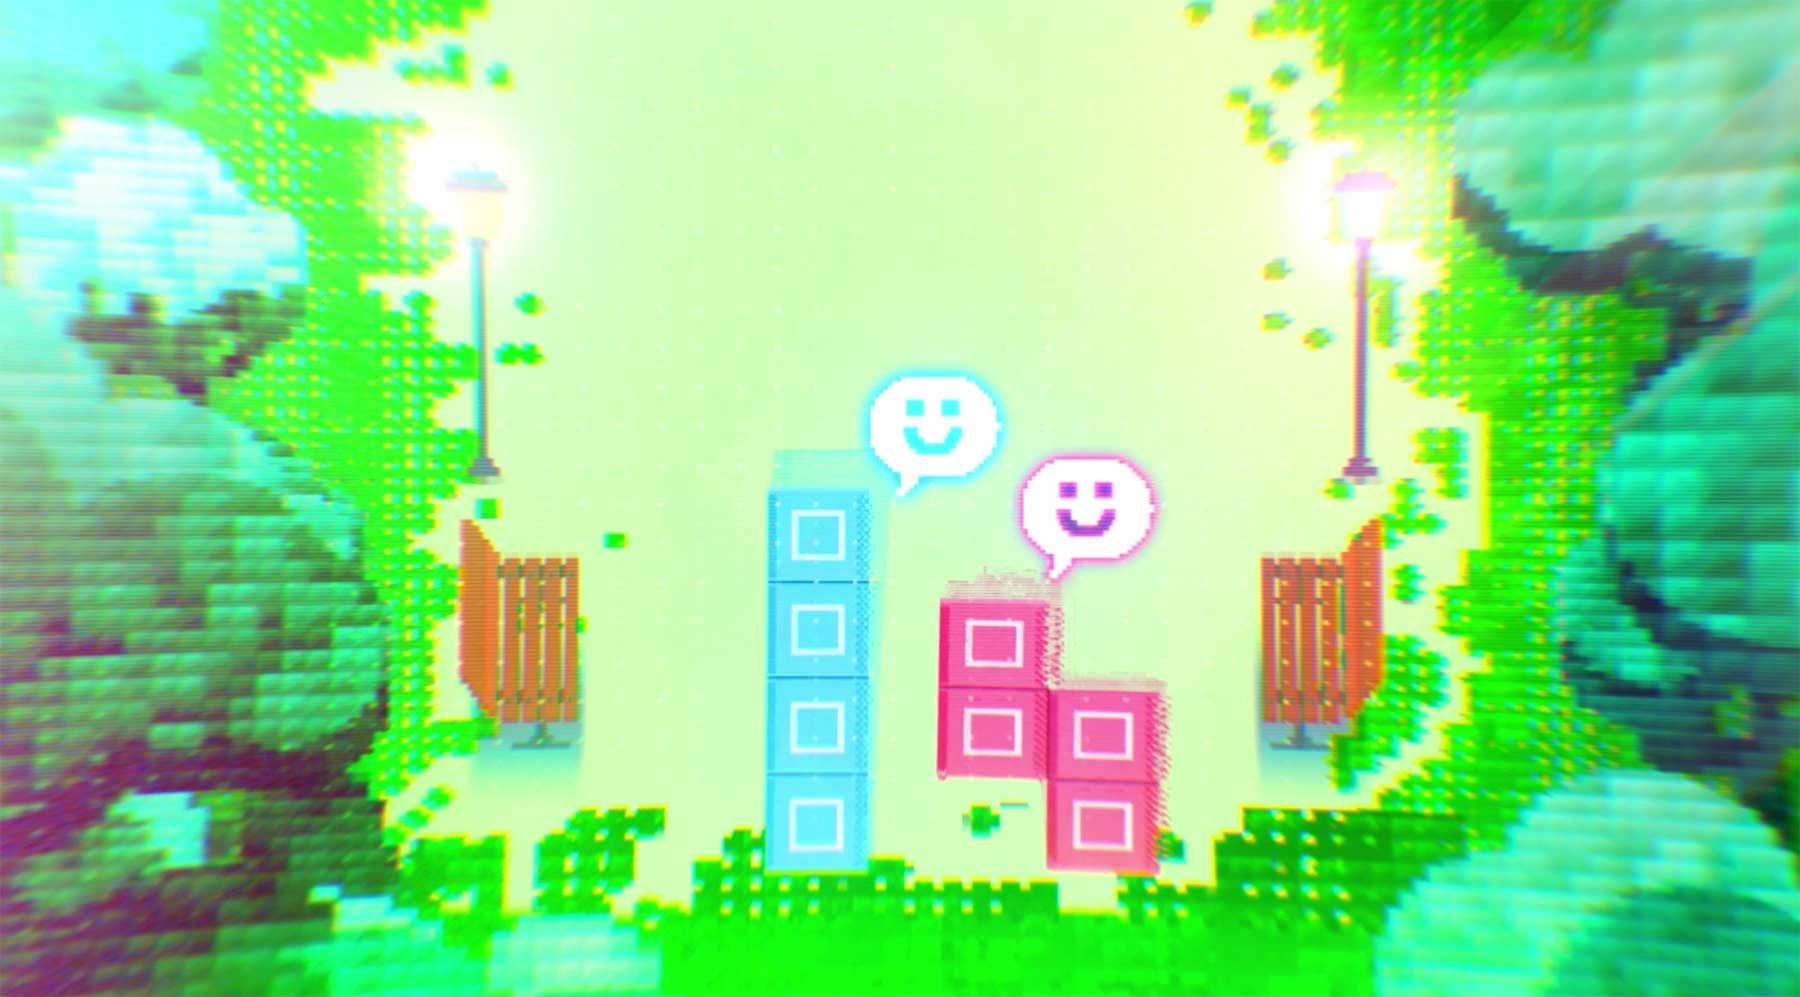 Die Liebesgeschichte zweier Tetris-Blöcke